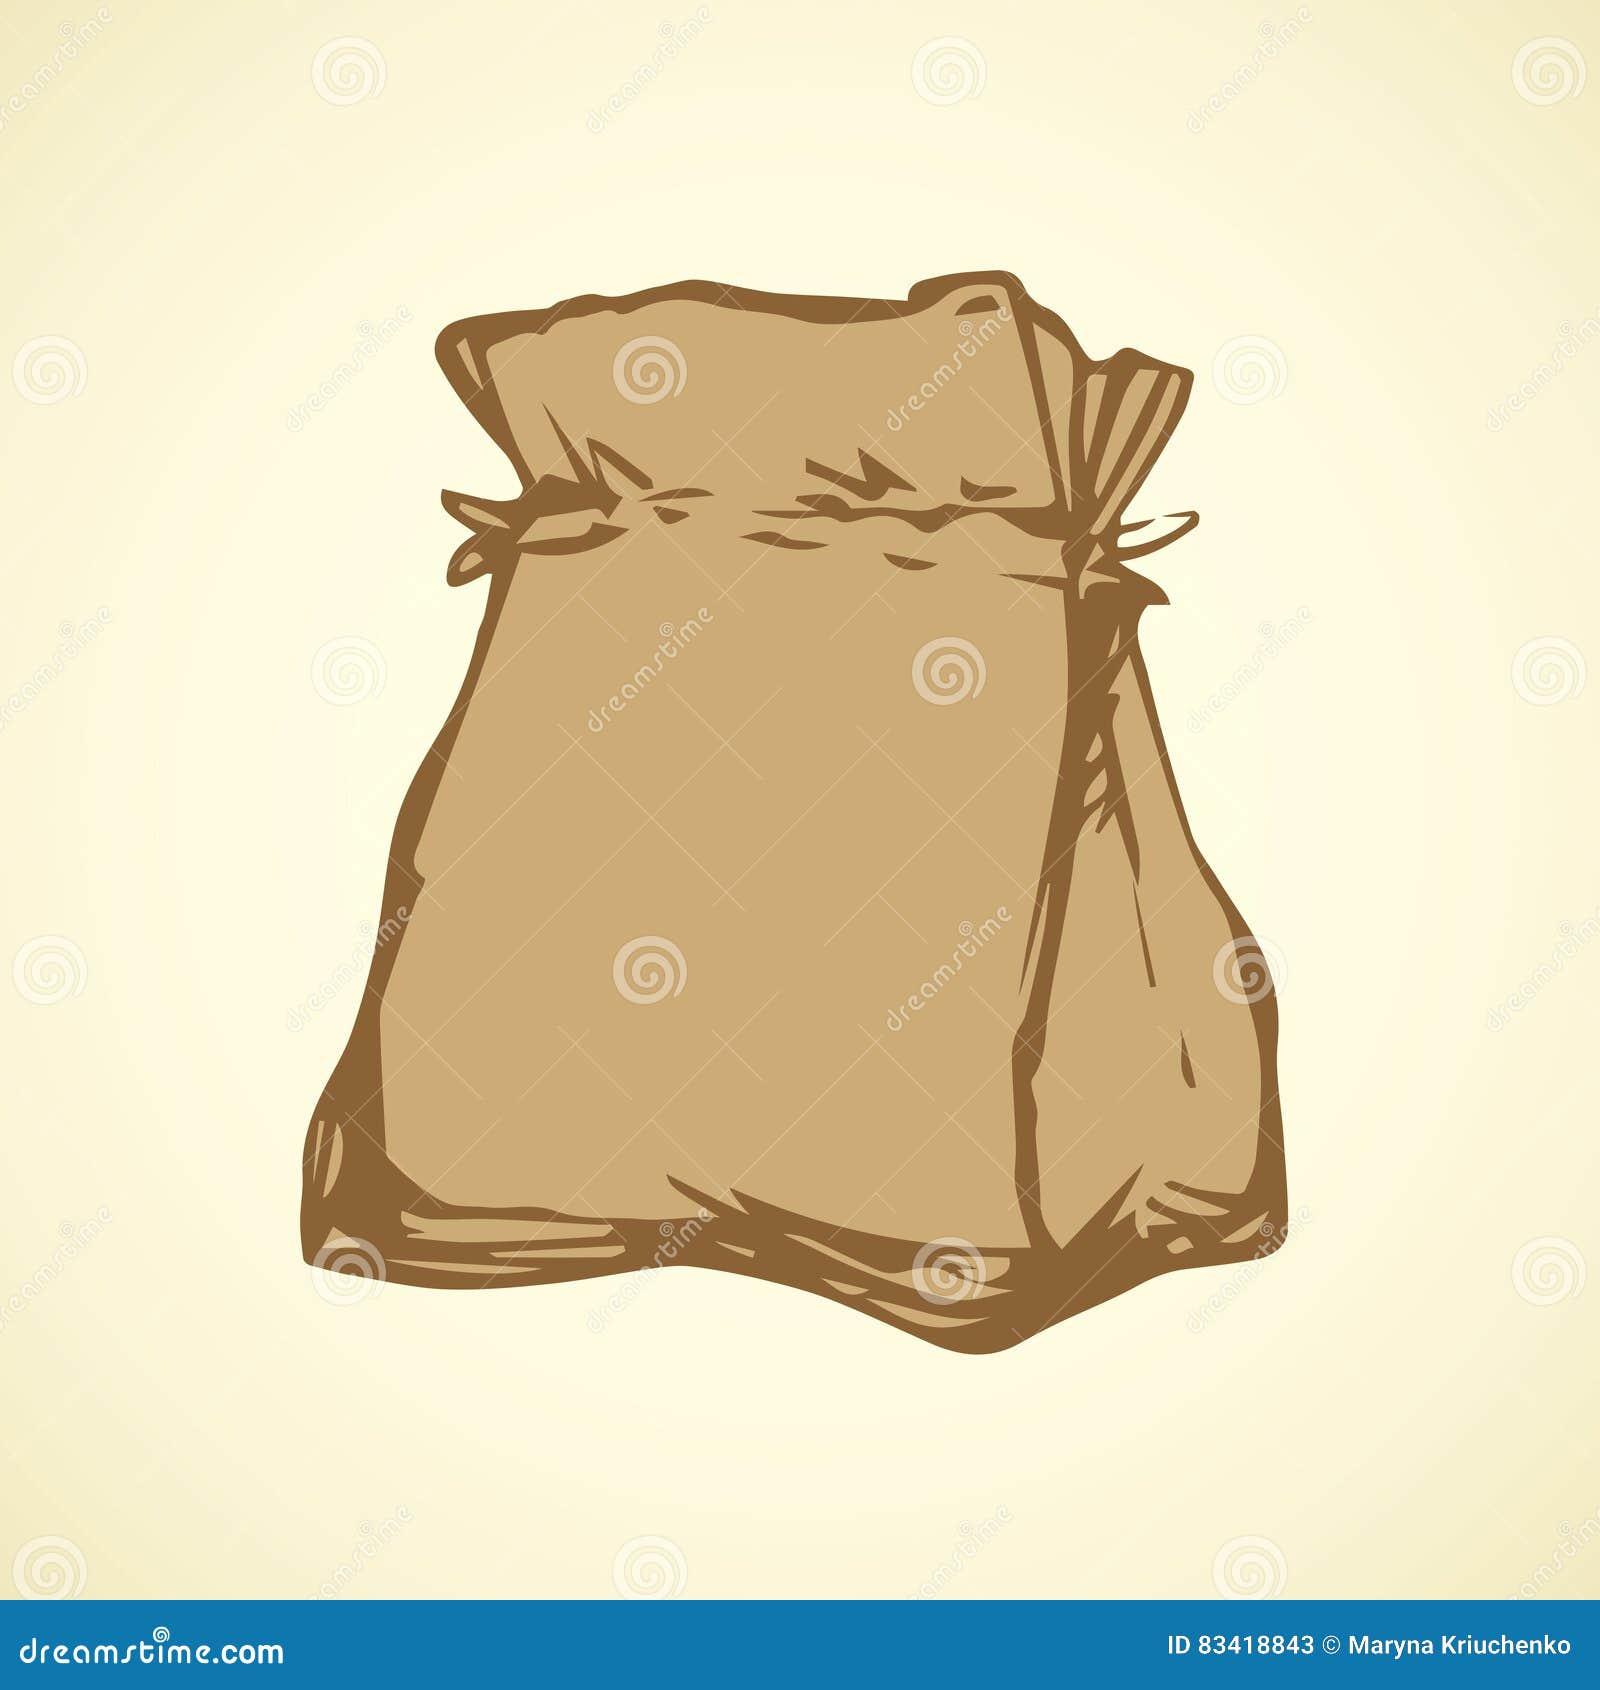 Paper bag vector - Paper Bag Vector Drawing